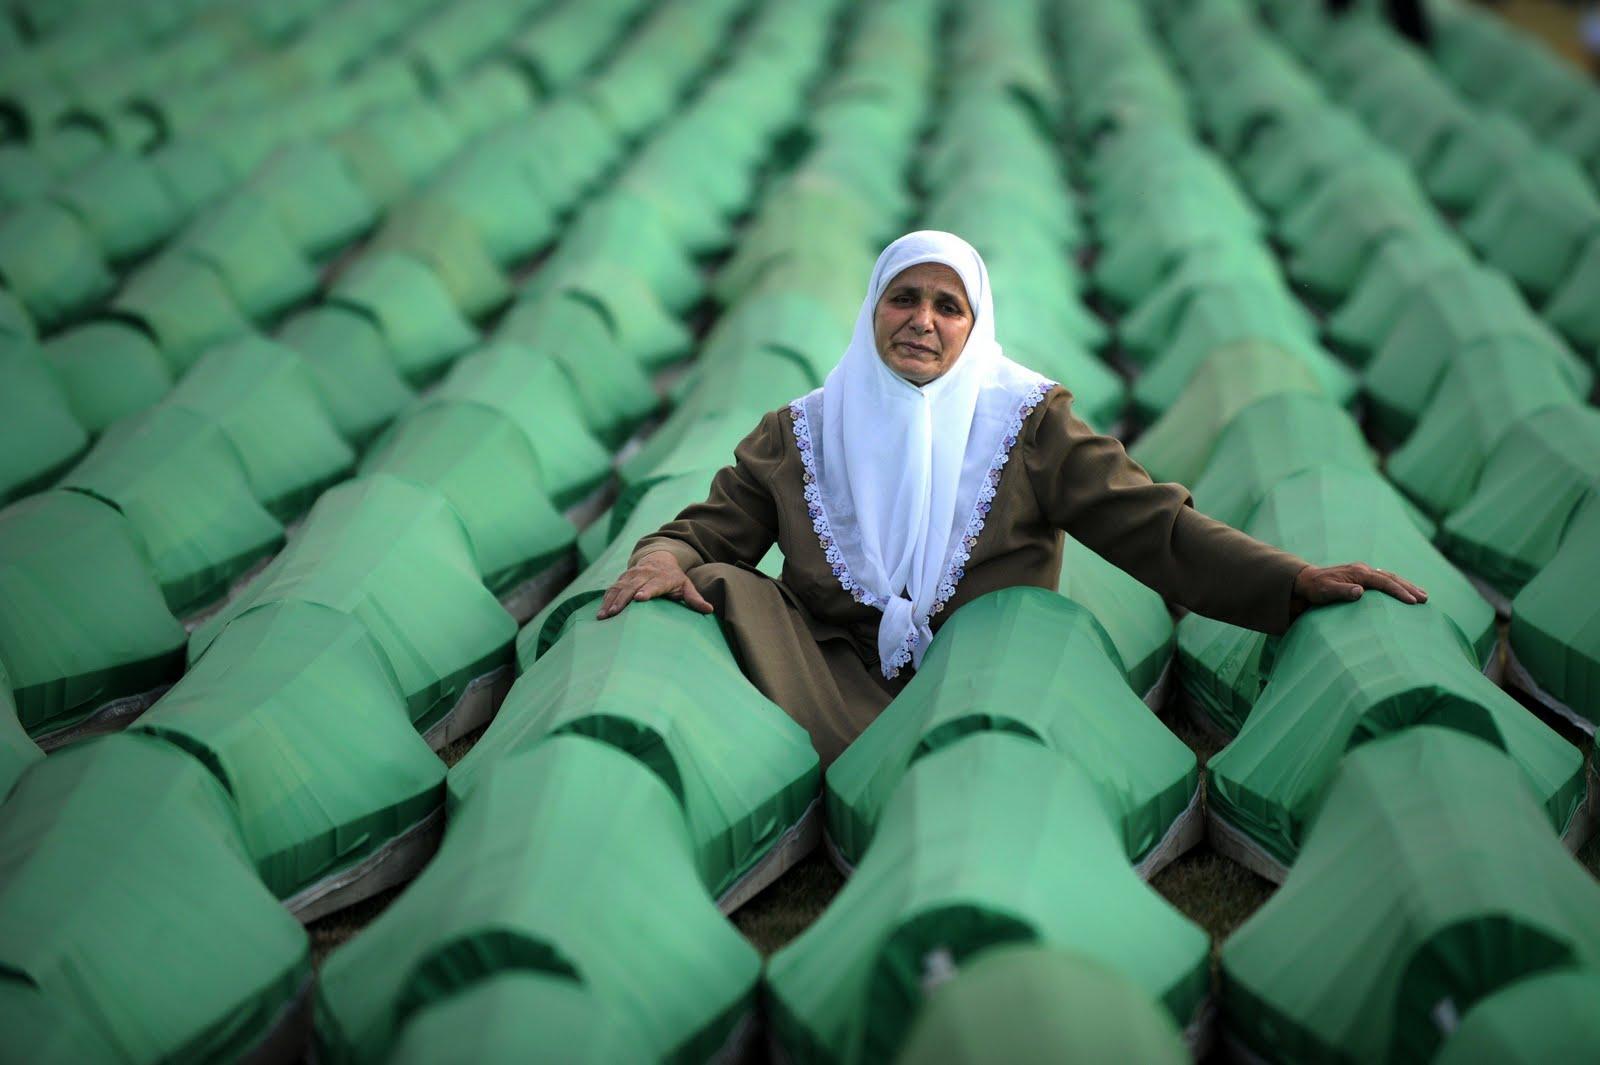 Srebrenica 1995: Shooting Muslims in a Barrel